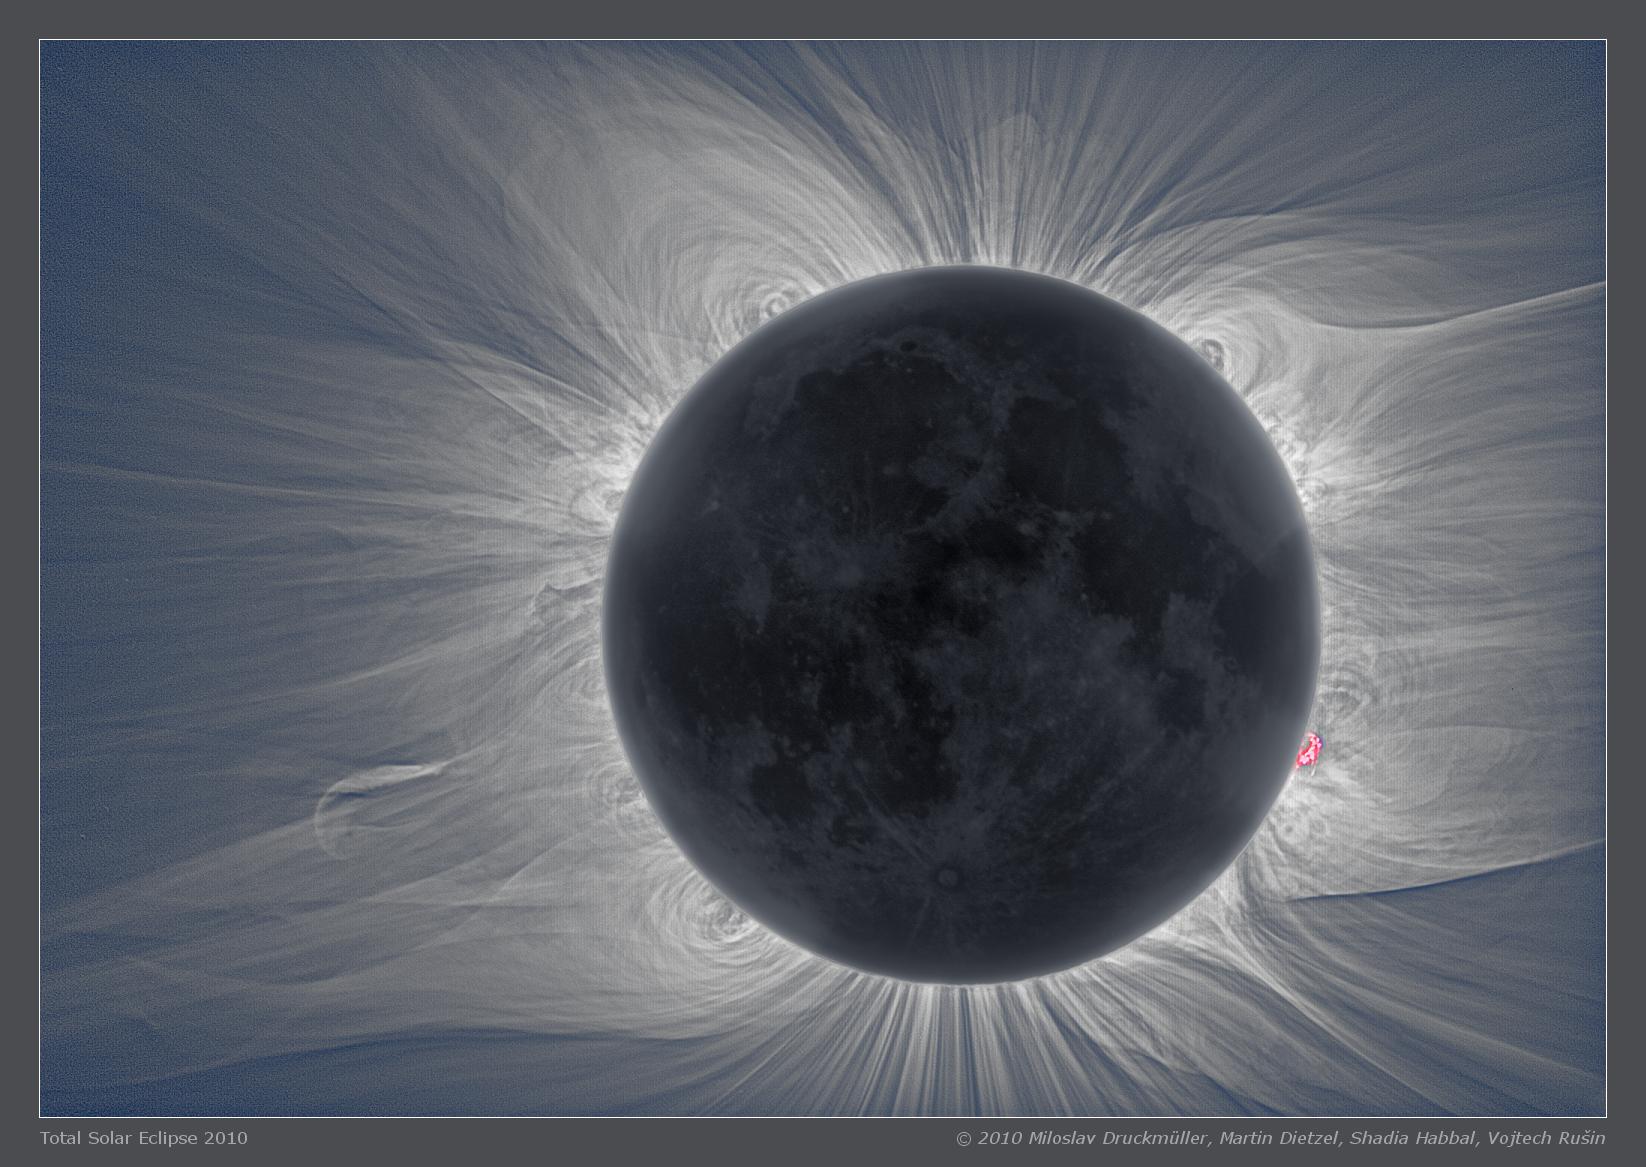 The Sun S Corona And The Moon